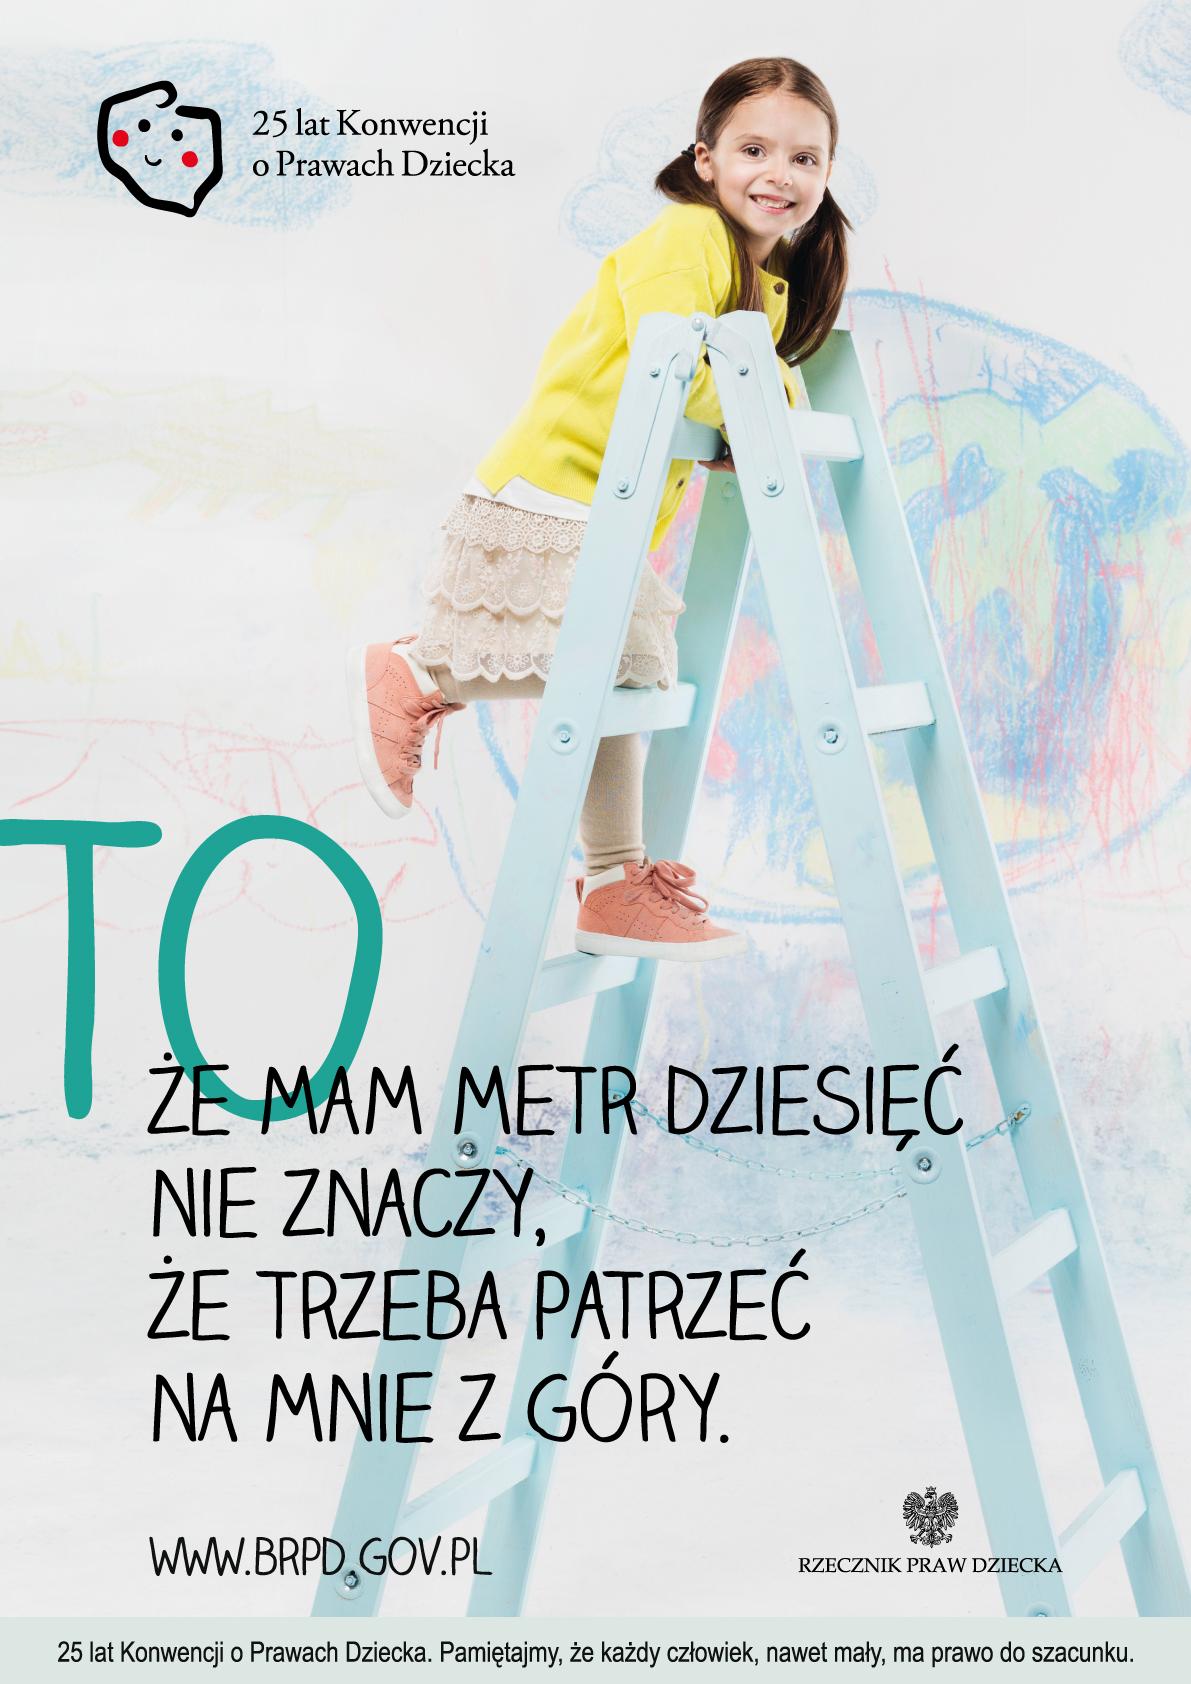 http://brpd.gov.pl/sites/default/files/plakat_25_lat_kopd_-_dziewczynka.jpg